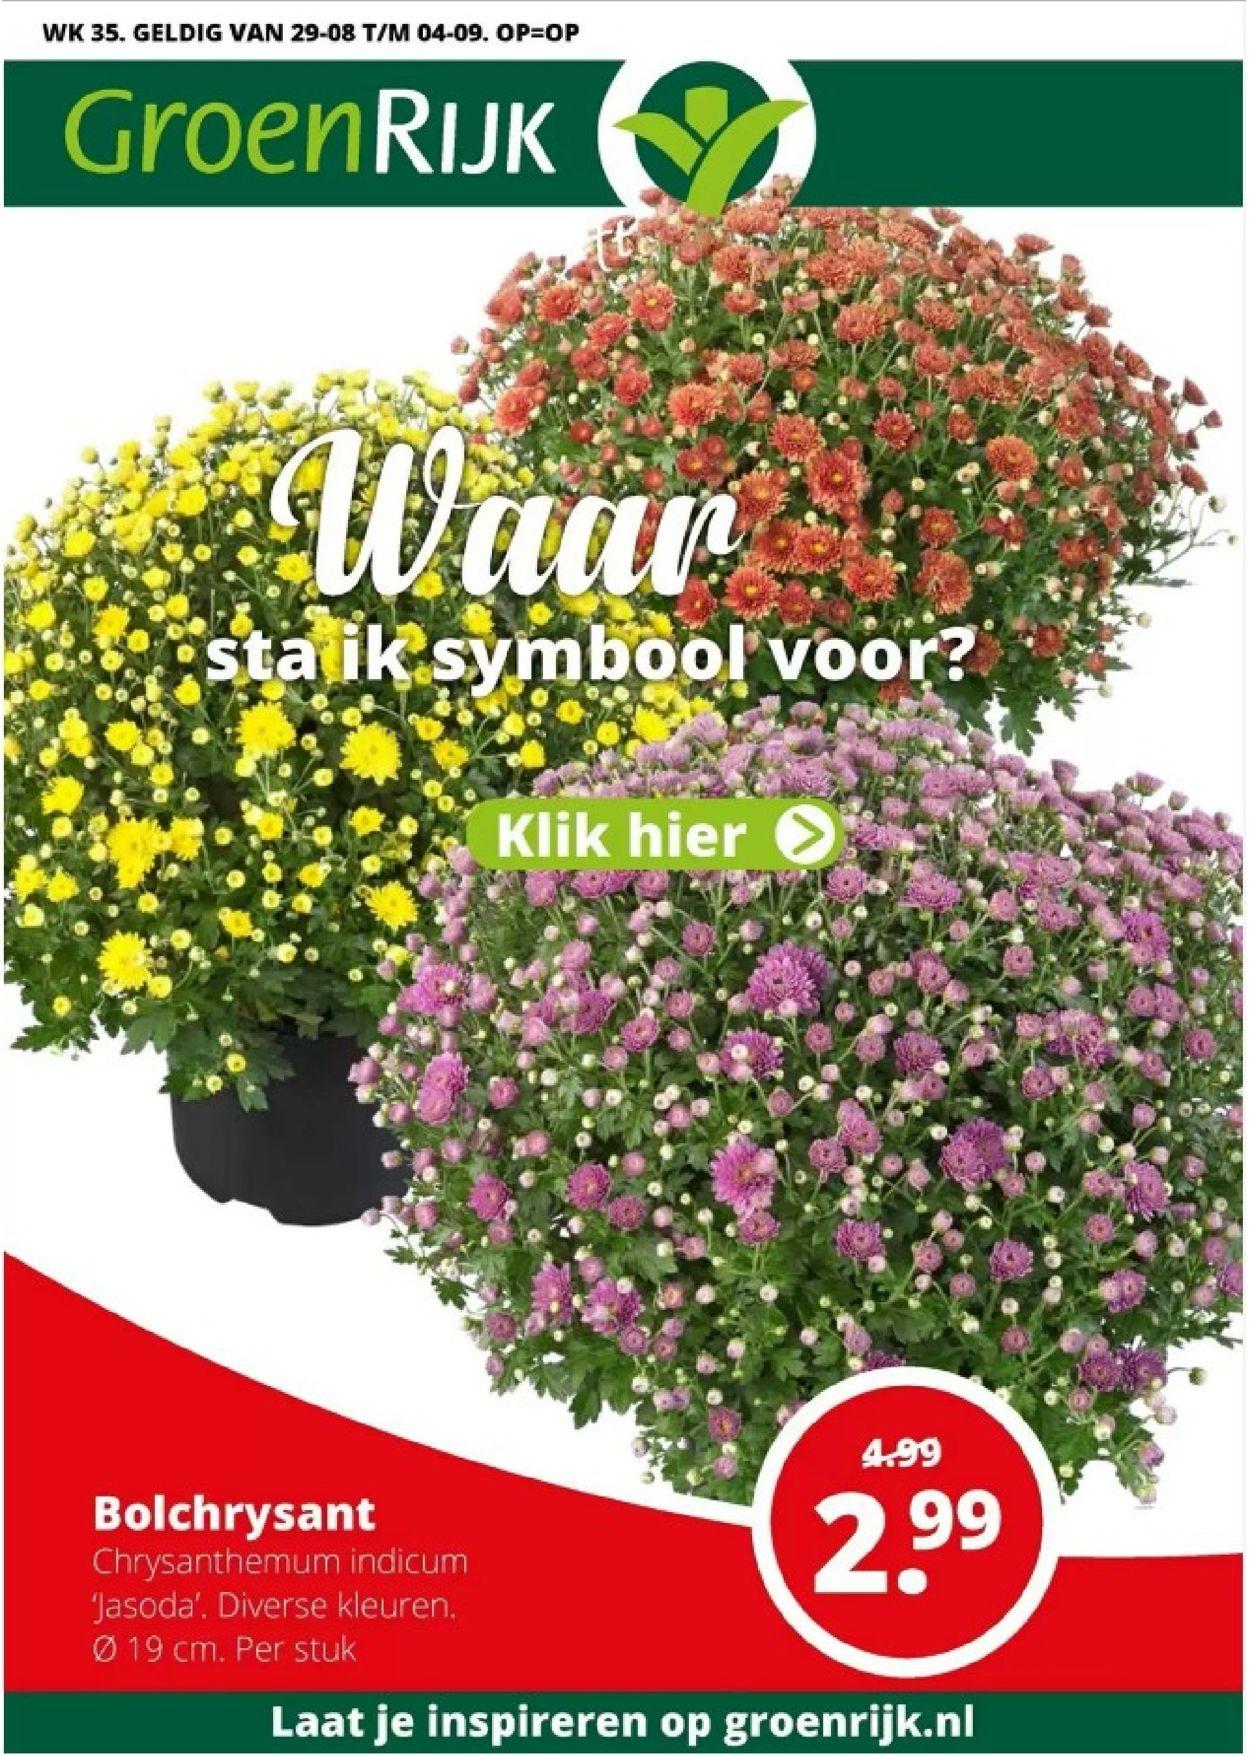 GroenRijk Folder - 29.08-04.09.2019